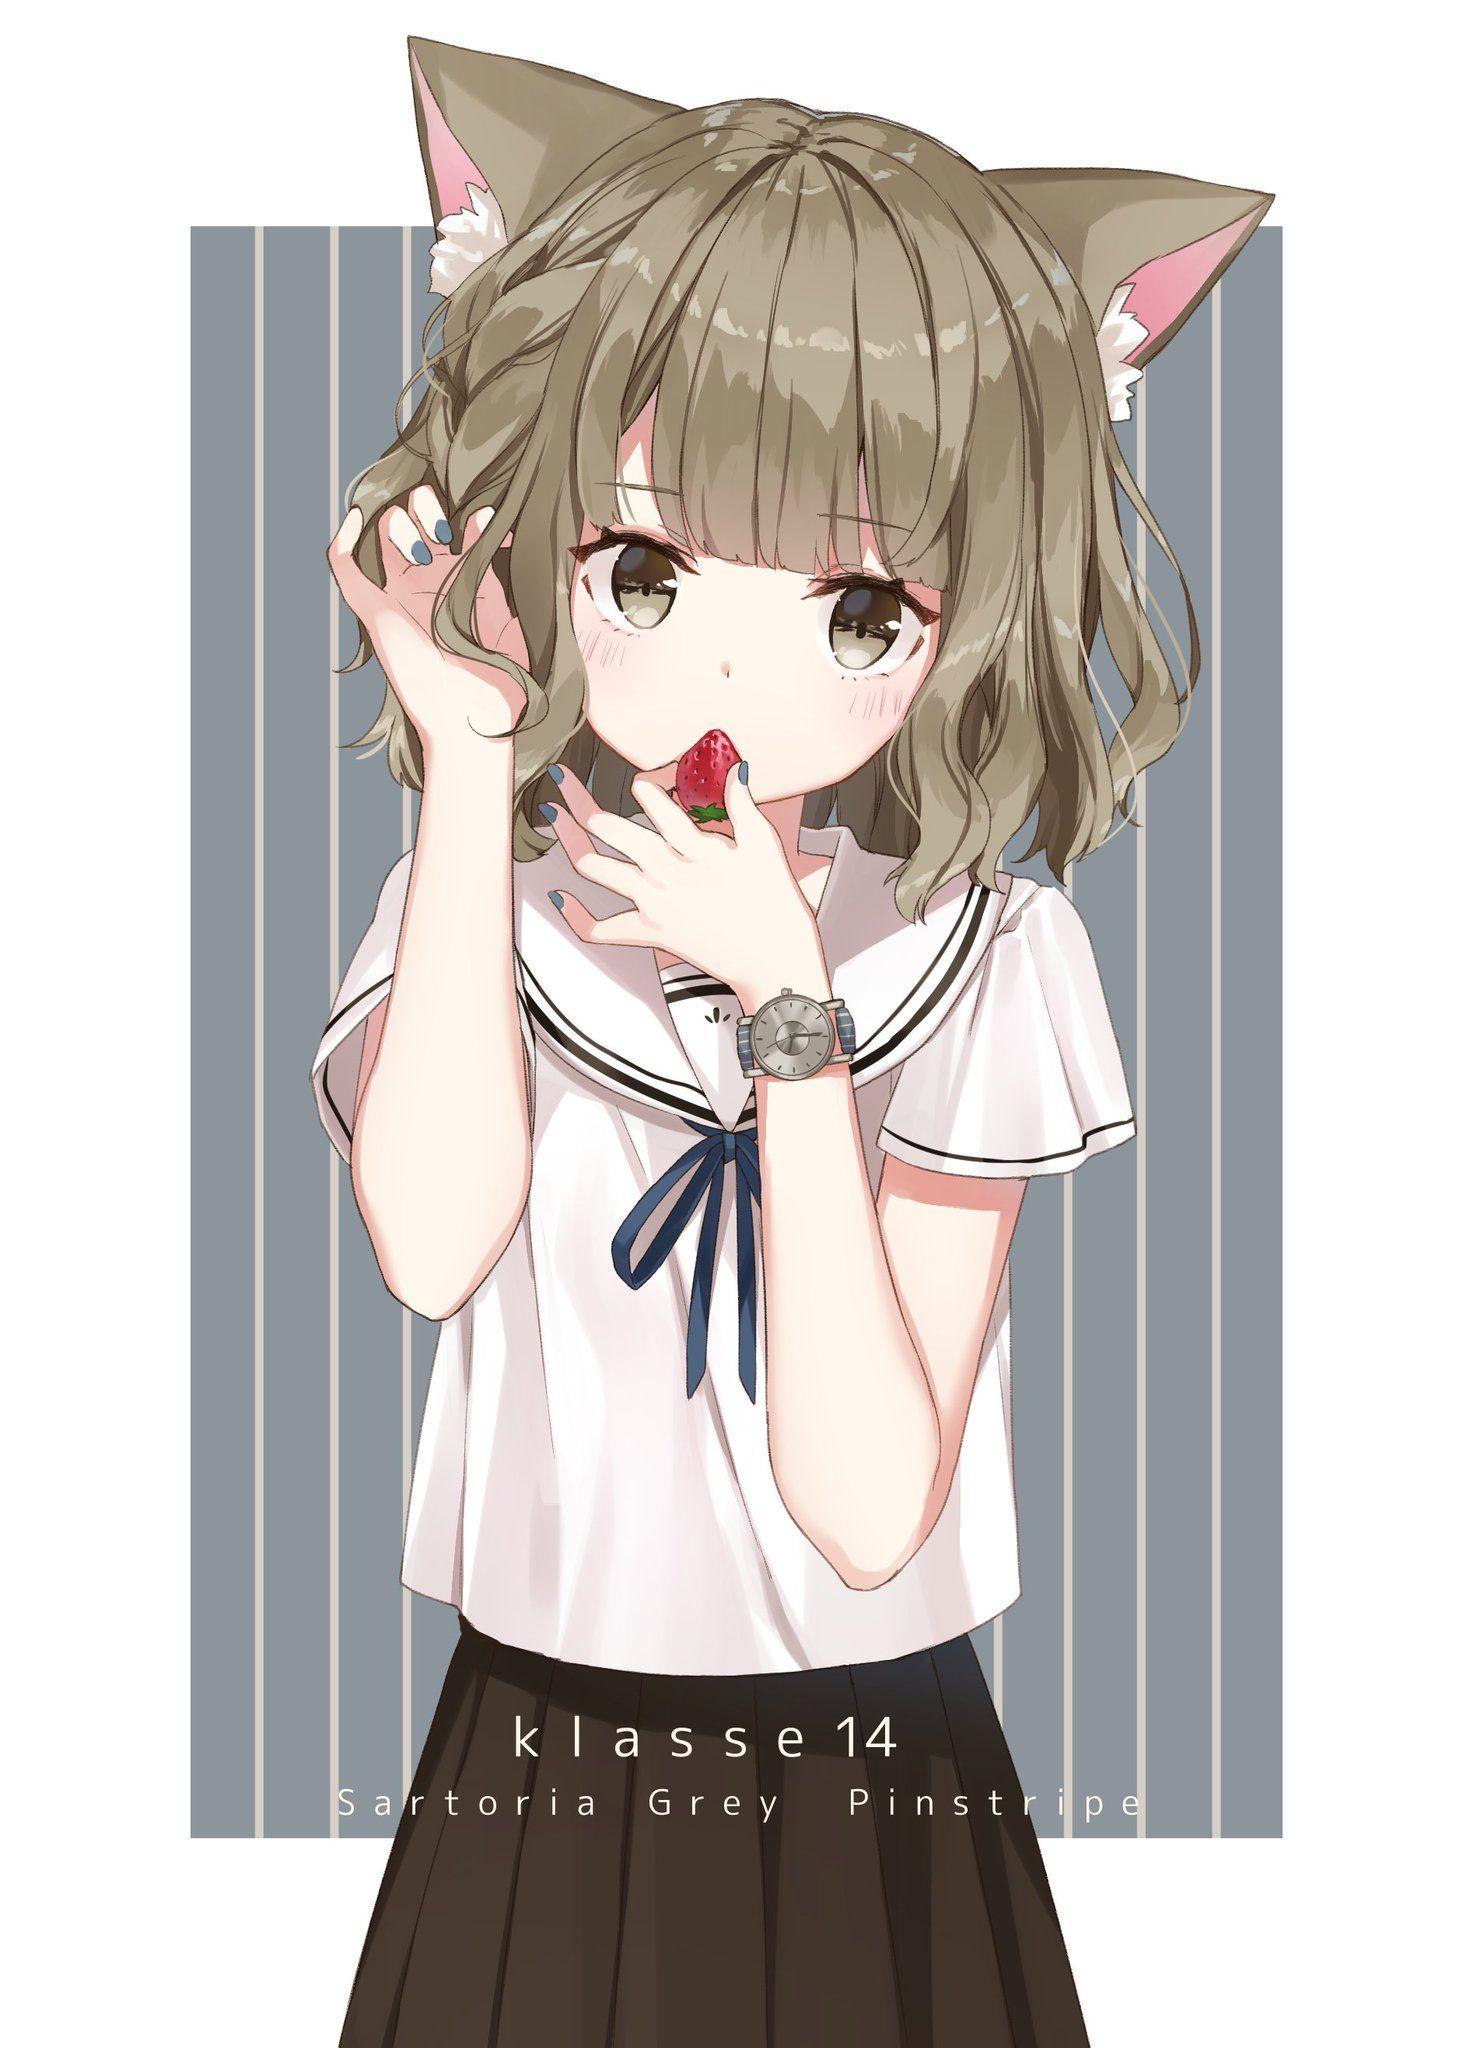 Pin by Mellie Roze on Anime girl Pinterest